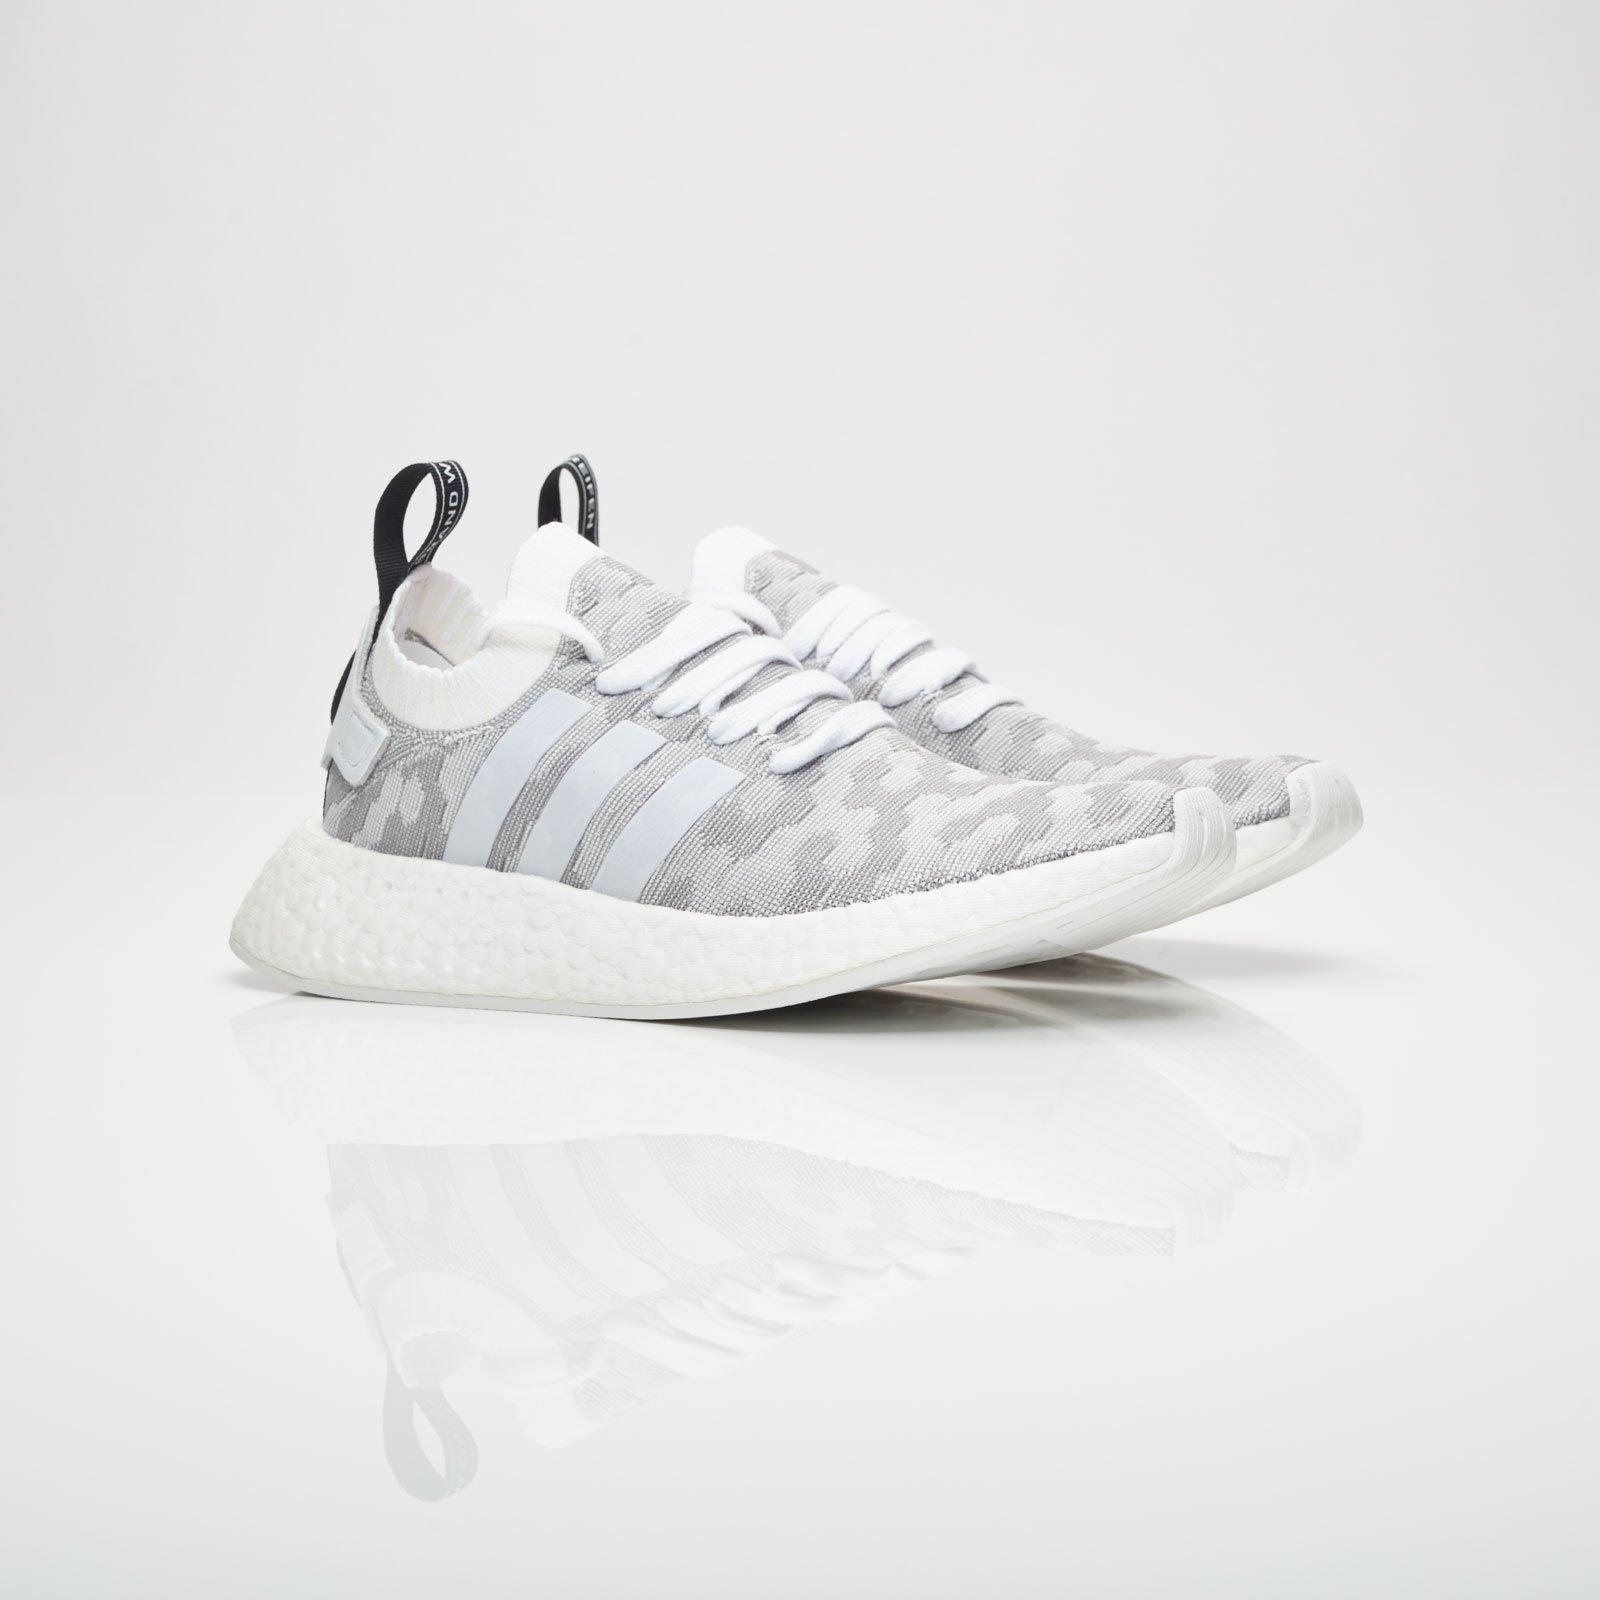 05a5c1f1c61db adidas NMD R2 PK W - By9520 - Sneakersnstuff